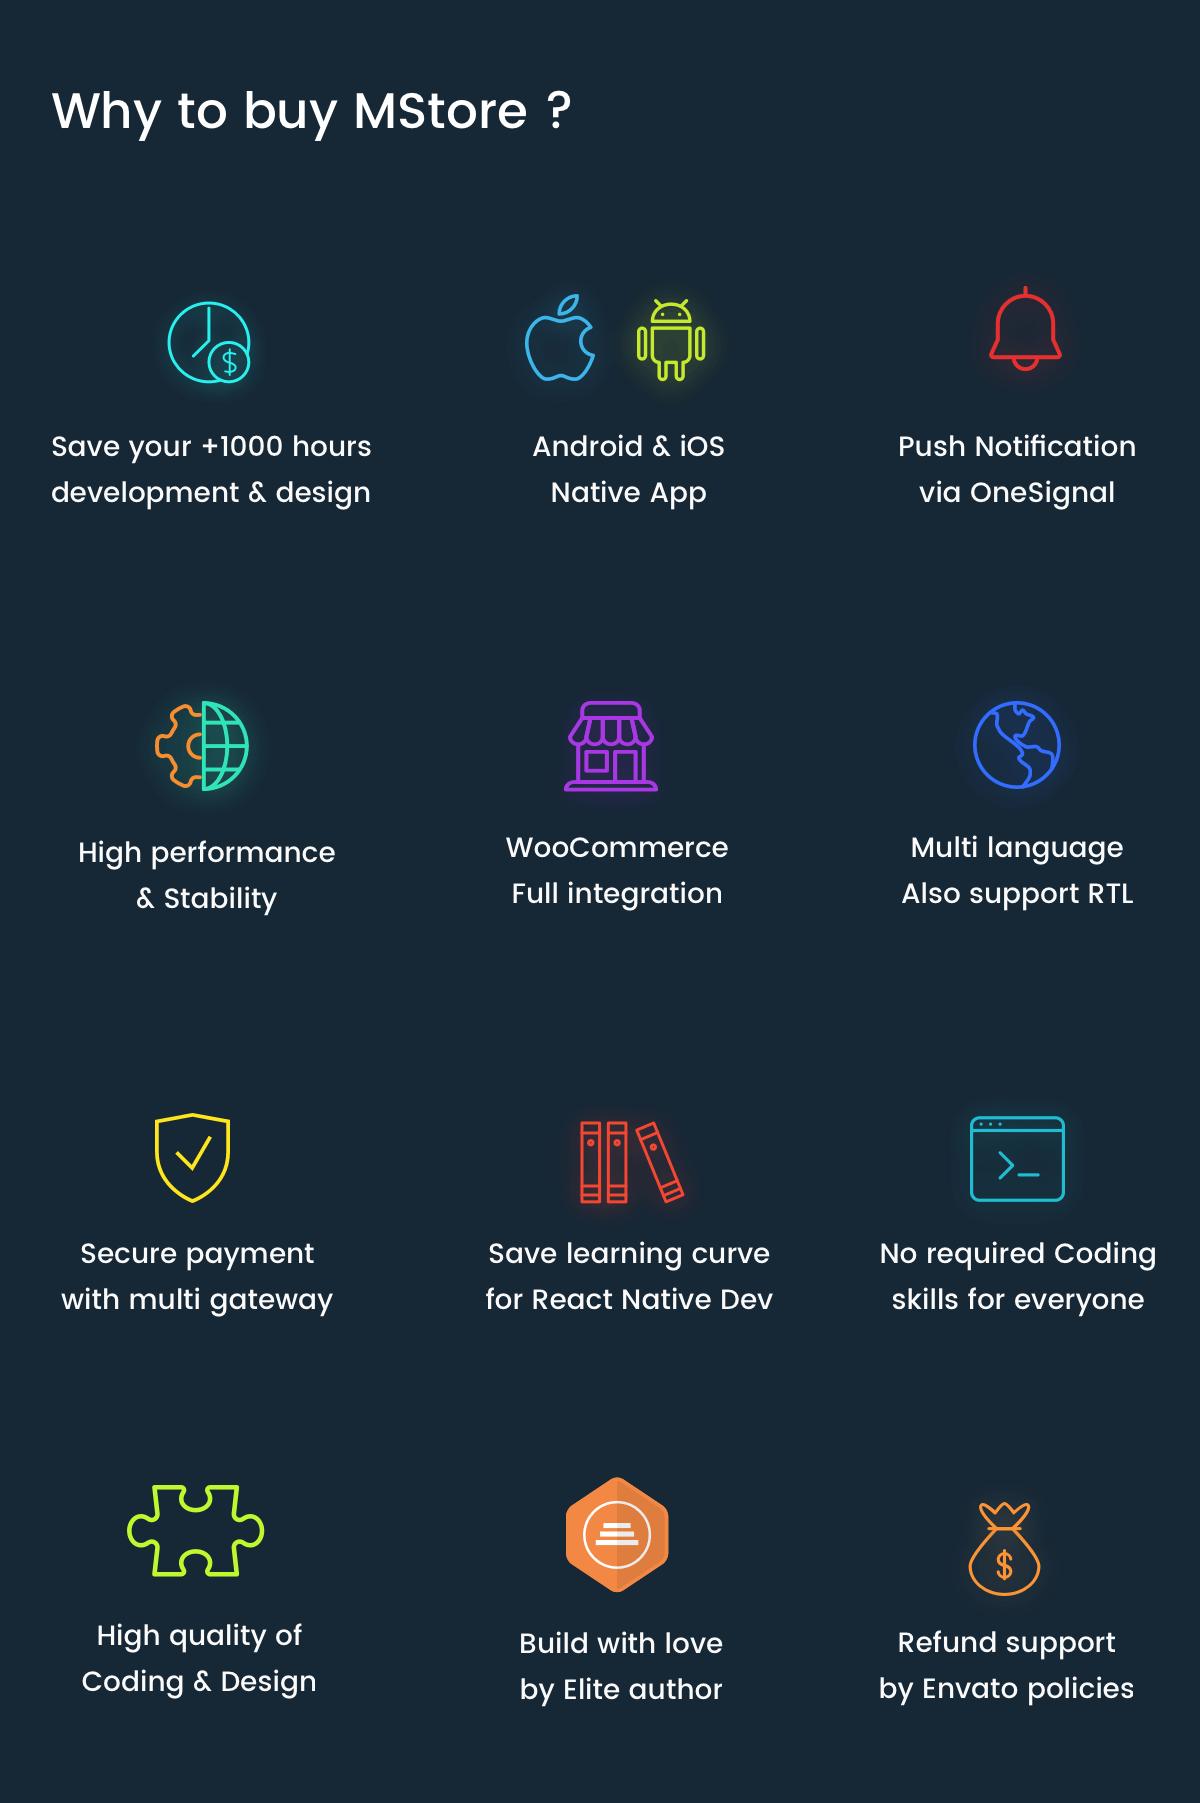 687474703a2f2f6d73746f72652e696f2f77702d636f6e74656e742f75706c6f6164732f323031382f30372f7768792d312e706e67 - سورس اپلیکیشن MStore pro Multi vendor | اپلیکیشن ووکامرس و دکان ( android / Ios )